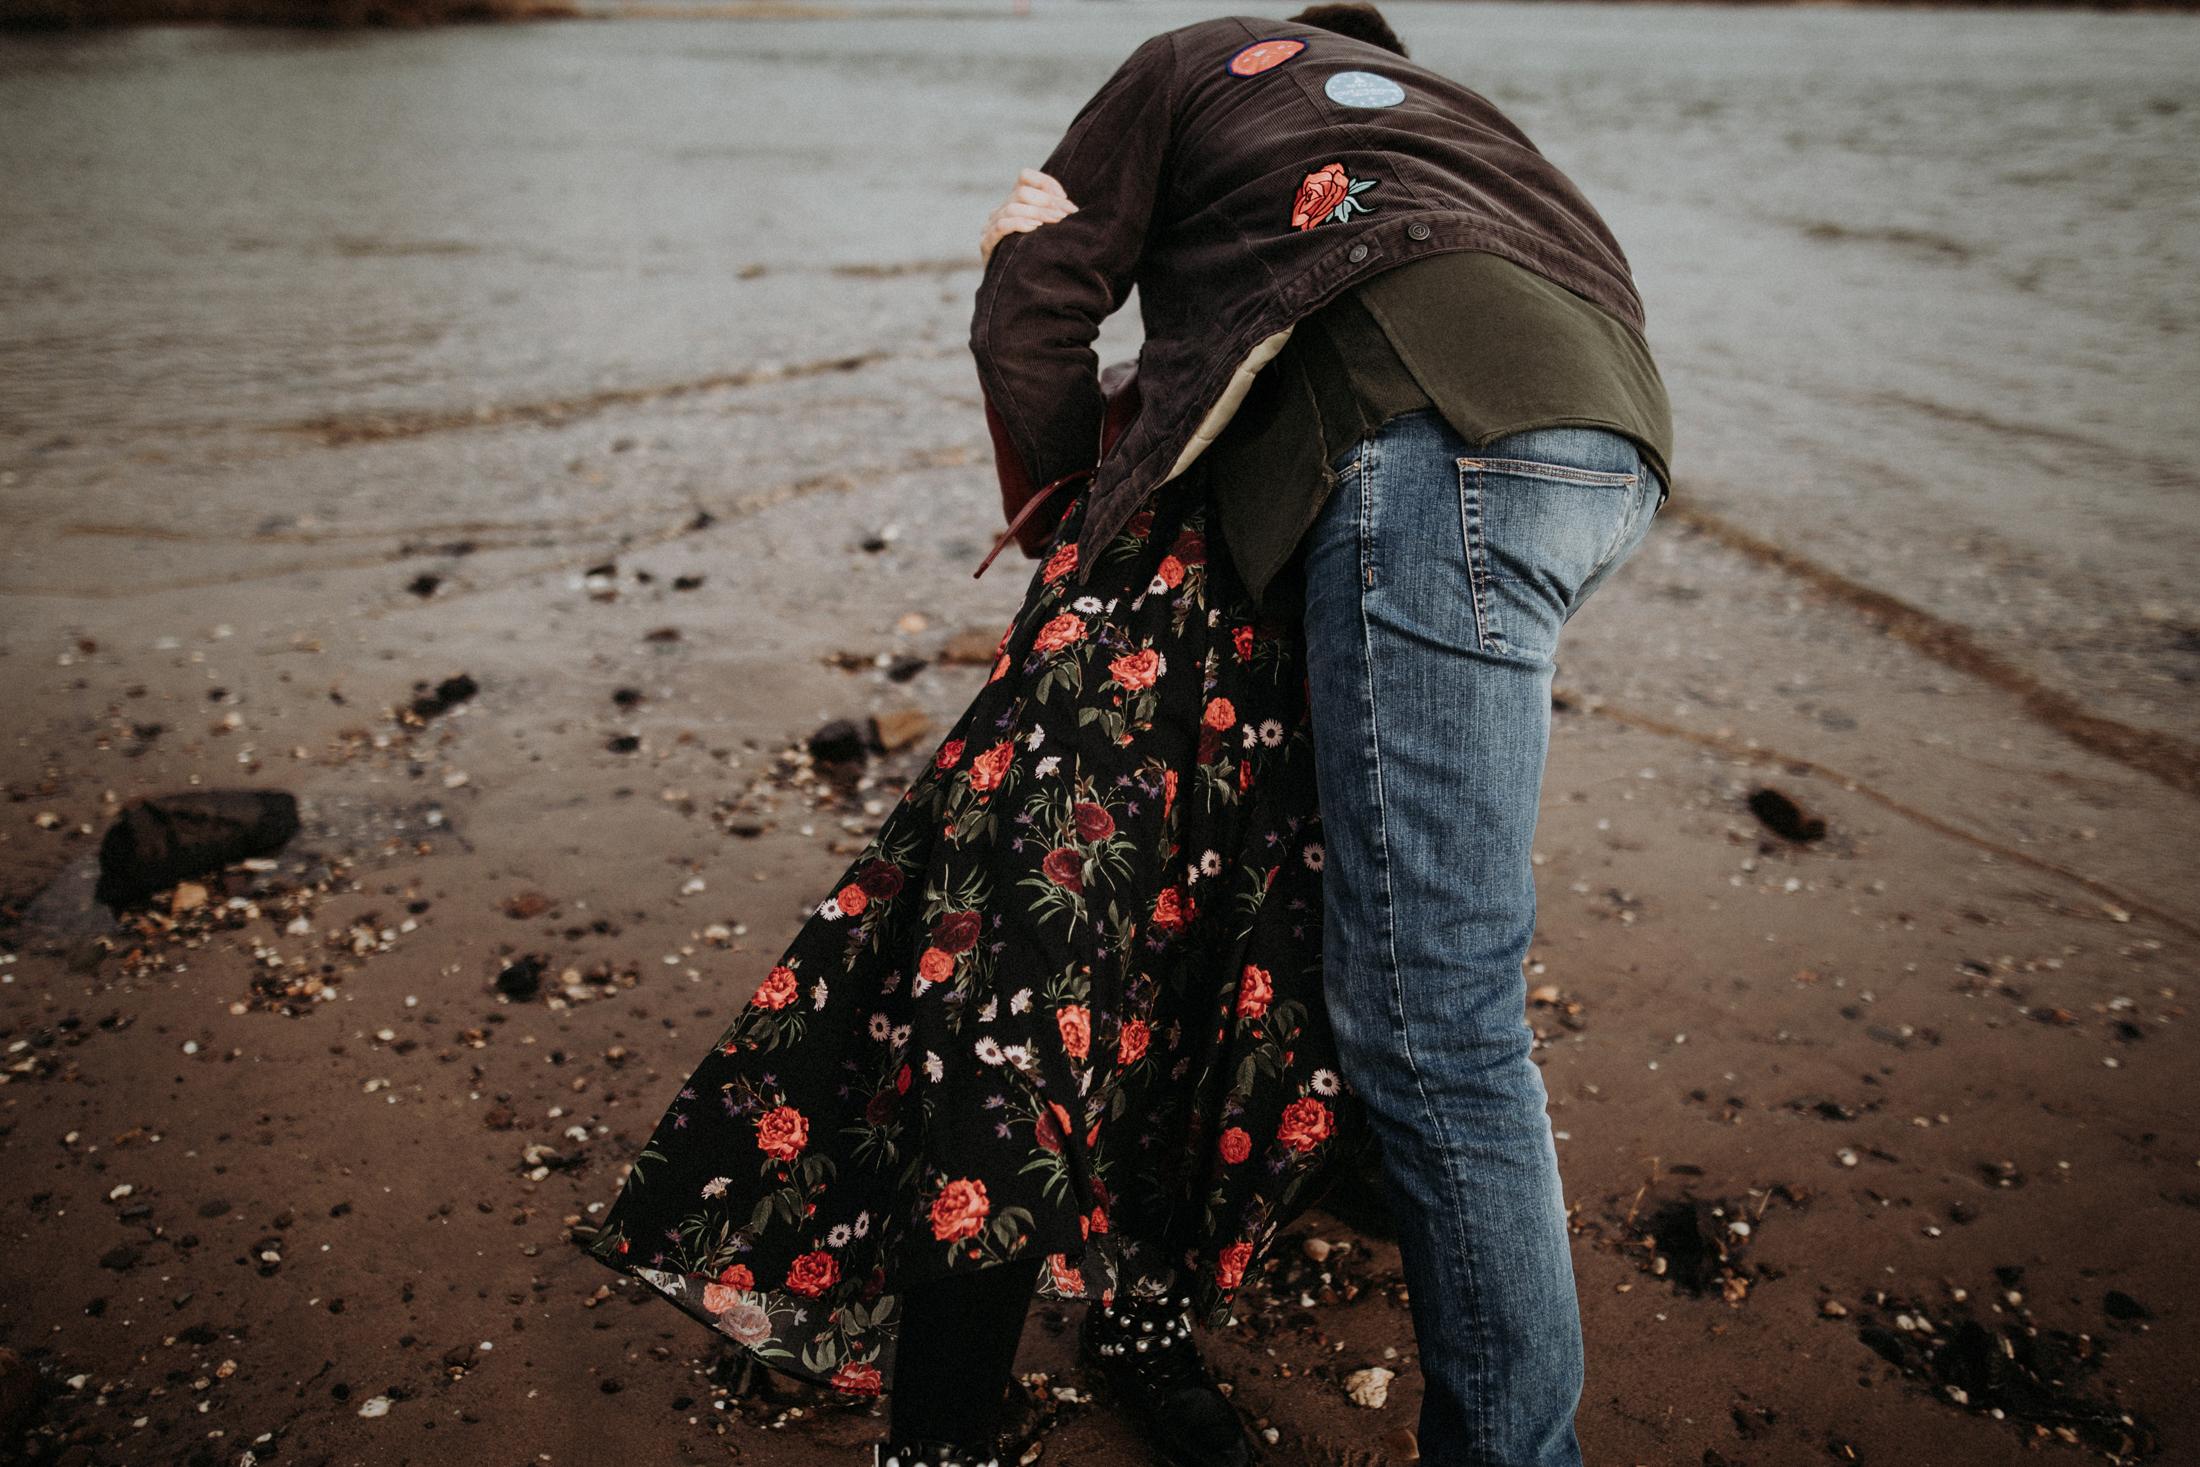 Wedding_Photographer_Mallorca_DanielaMarquardt_Photography_CanaryIslands_Lanzarote_Iceland_Tuscany_Santorini_Portugal_NewYork_Spain_Elopement_Hochzeitsfotograf_CK97